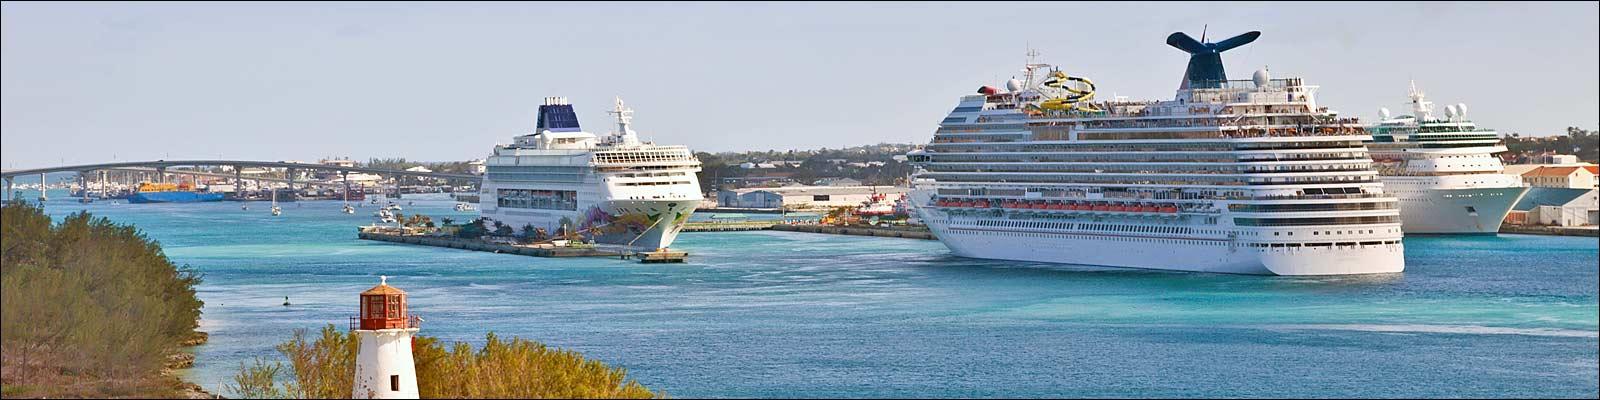 Cruise-SS03